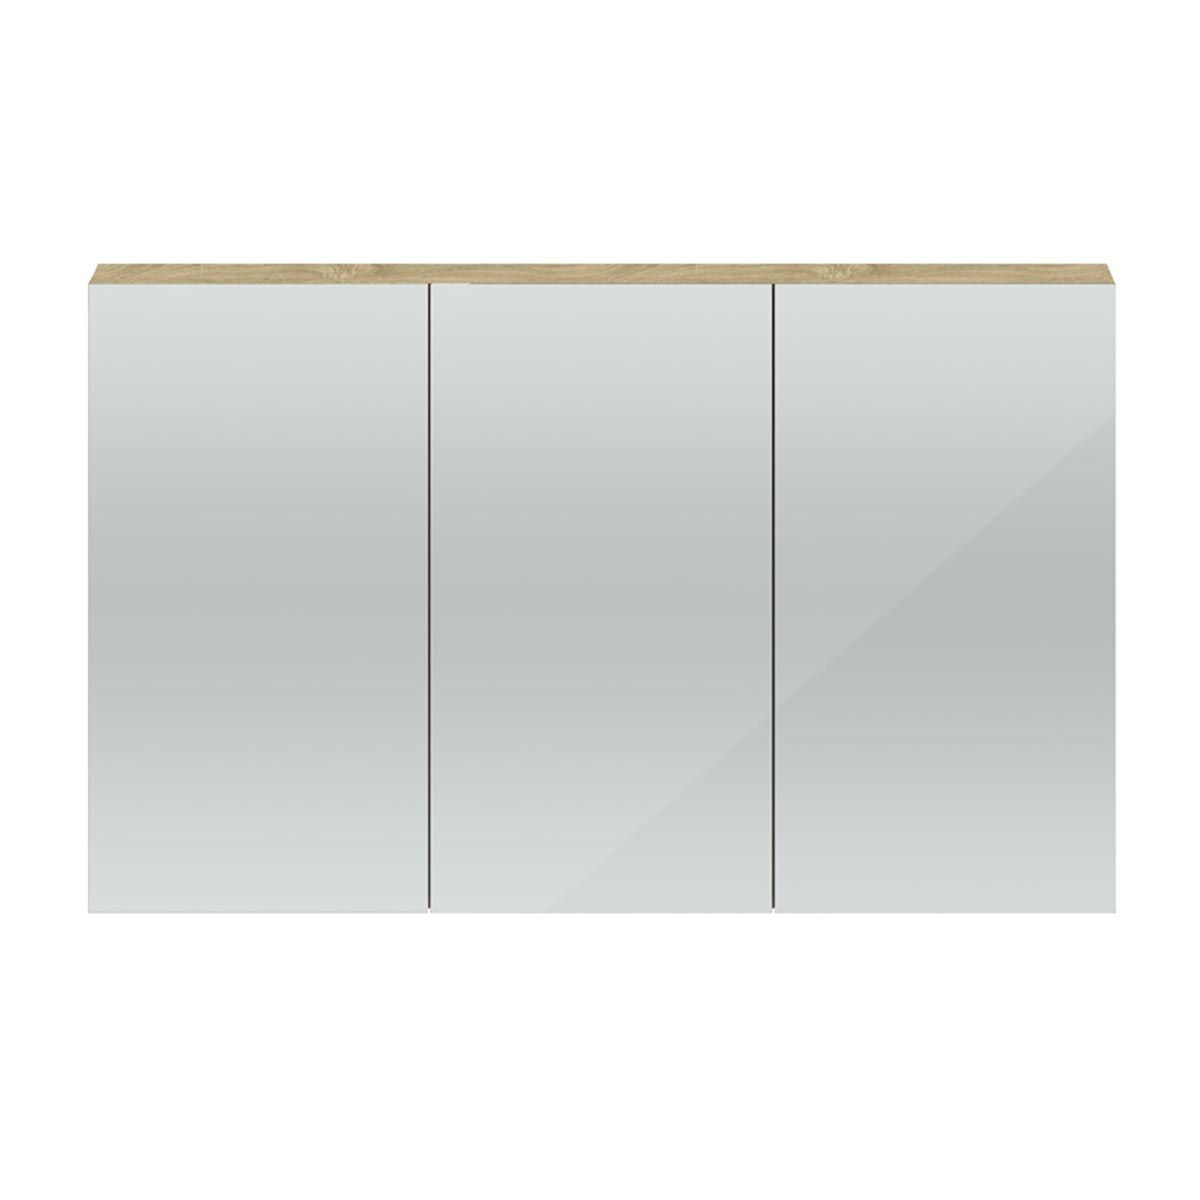 Hudson Reed Quartet Natural Oak 3 Door Mirror Cabinet 1350mm